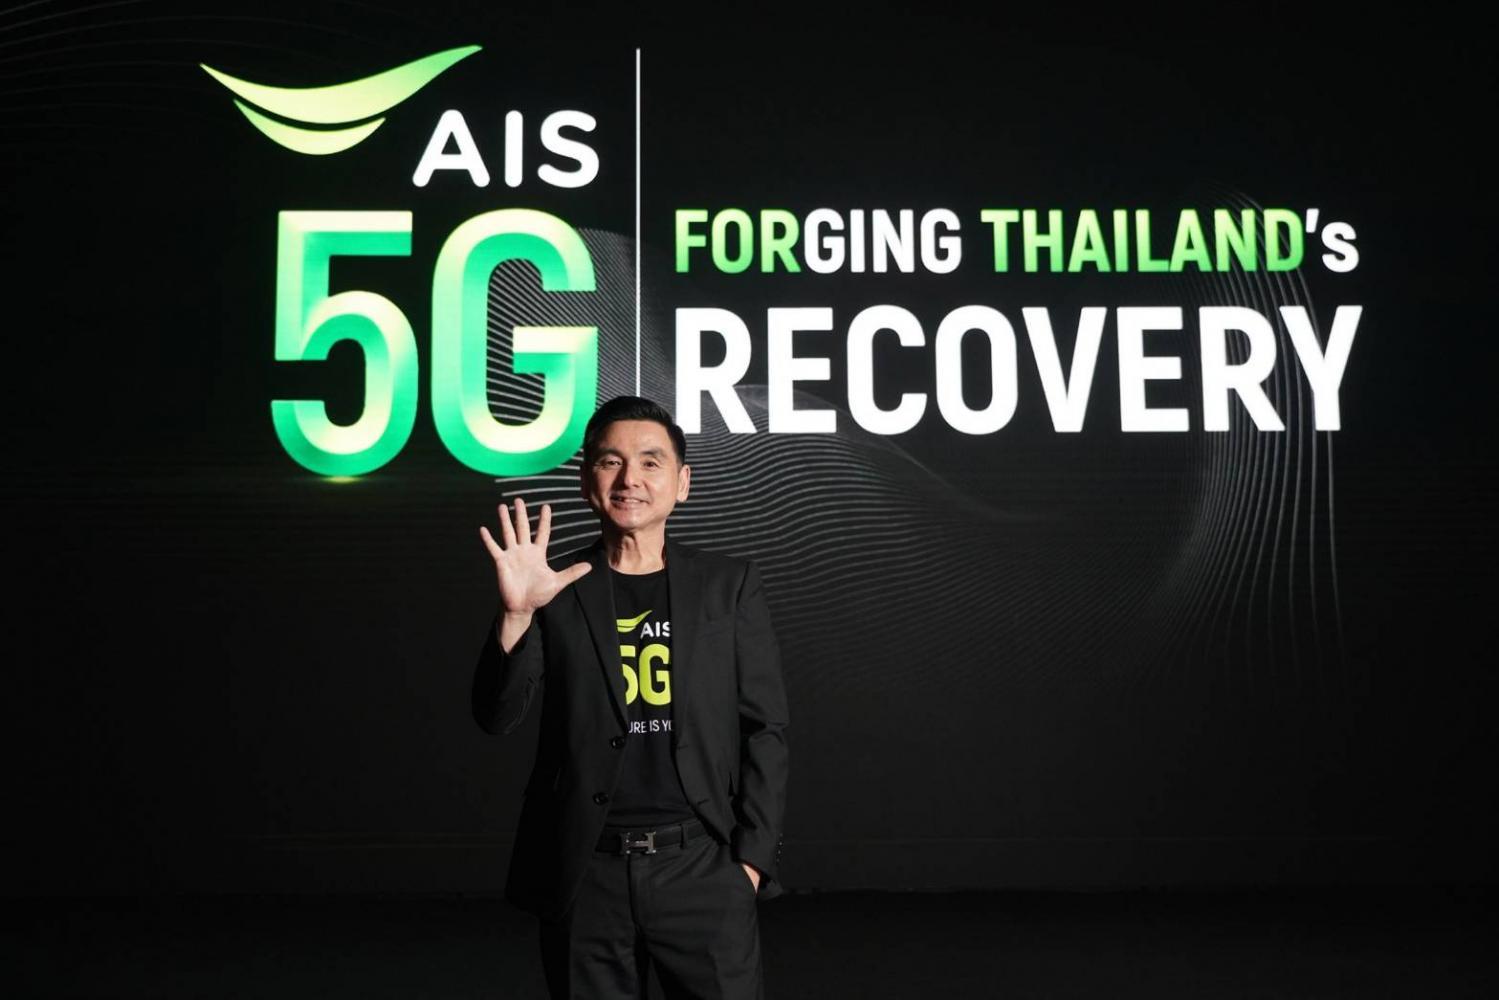 AIS chief executive Somchai Lertsutiwong